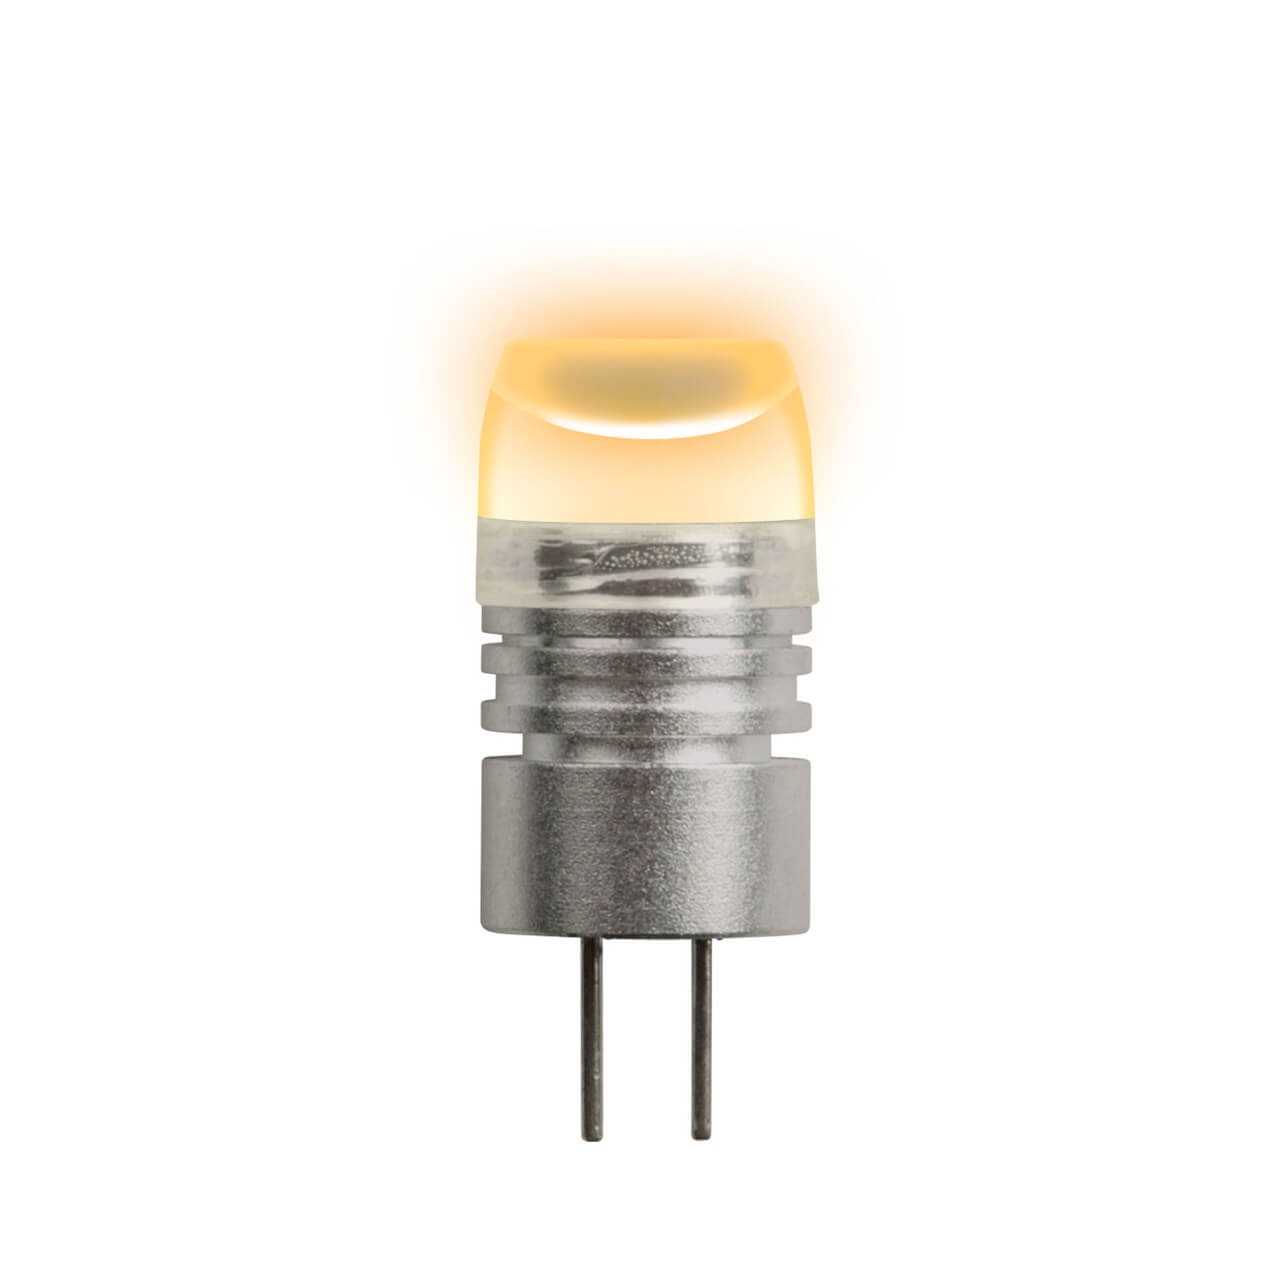 Лампа светодиодная (05857) G4 0,8W прозрачная LED-JC-12/0,8W/YELLOW/G4 uniel лампа галогенная uniel капсула прозрачная g4 35w jc 220 35 g4 cl 02585